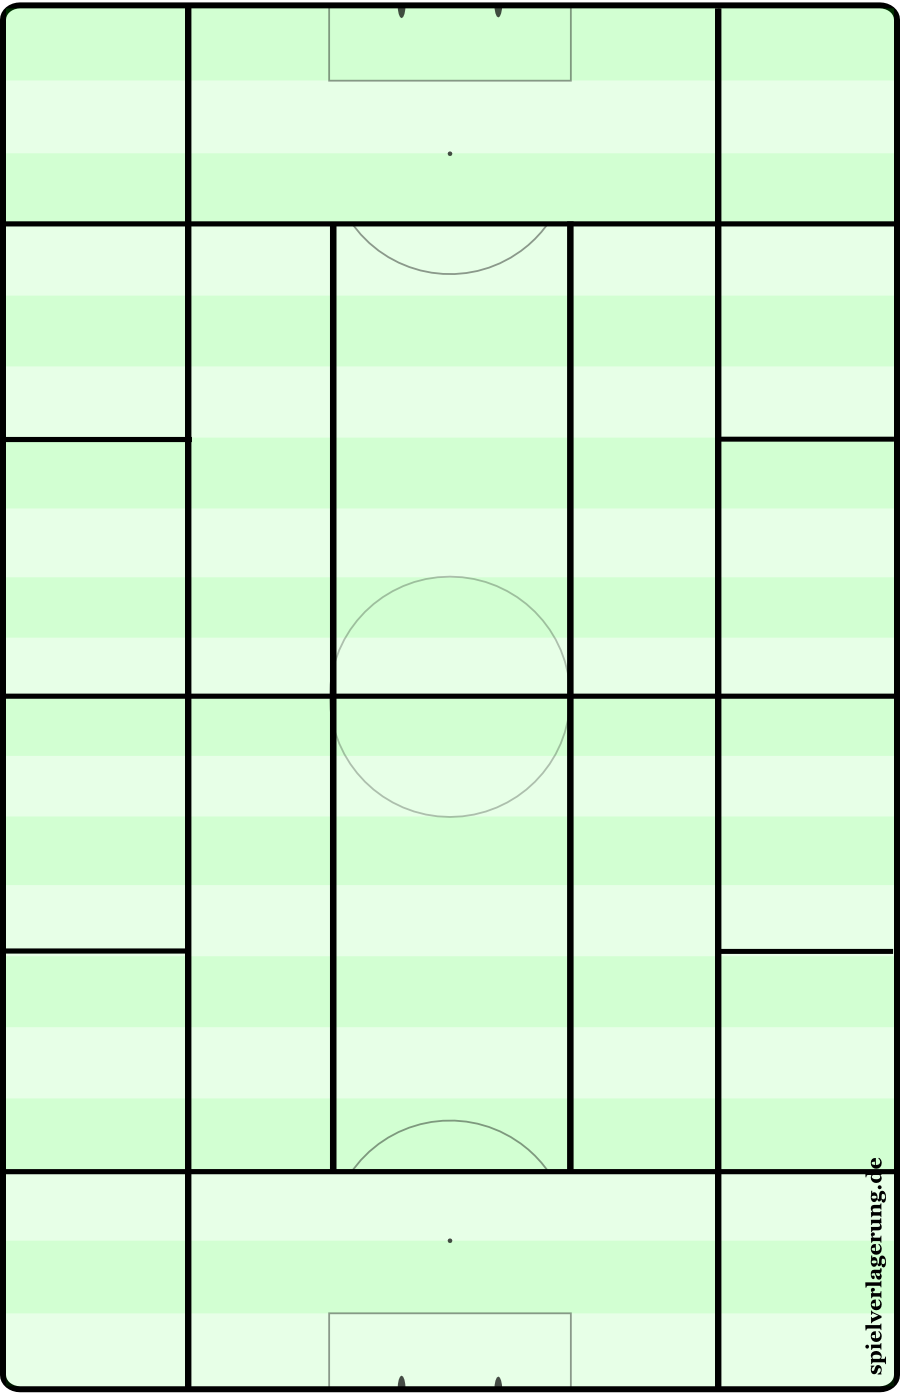 The framework for positioning.